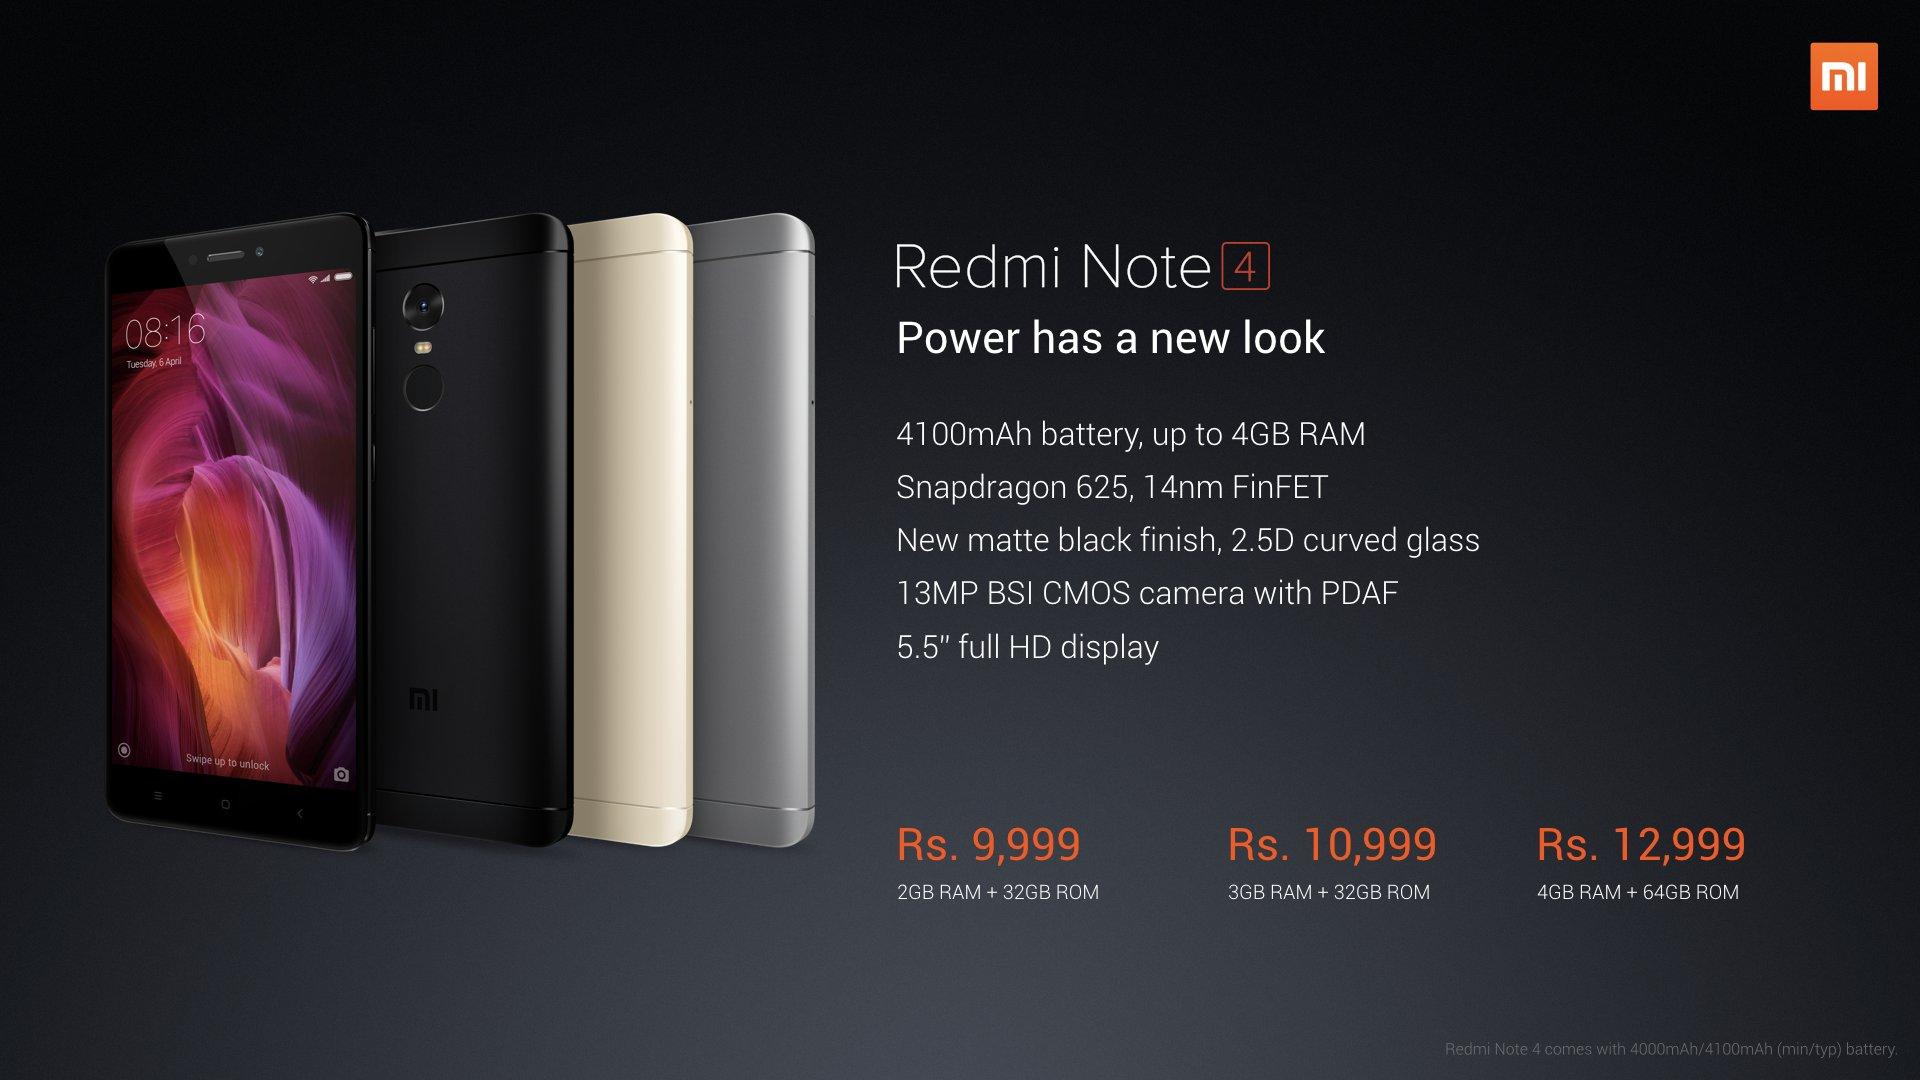 Redmi Note 4 best offer at Flipkart